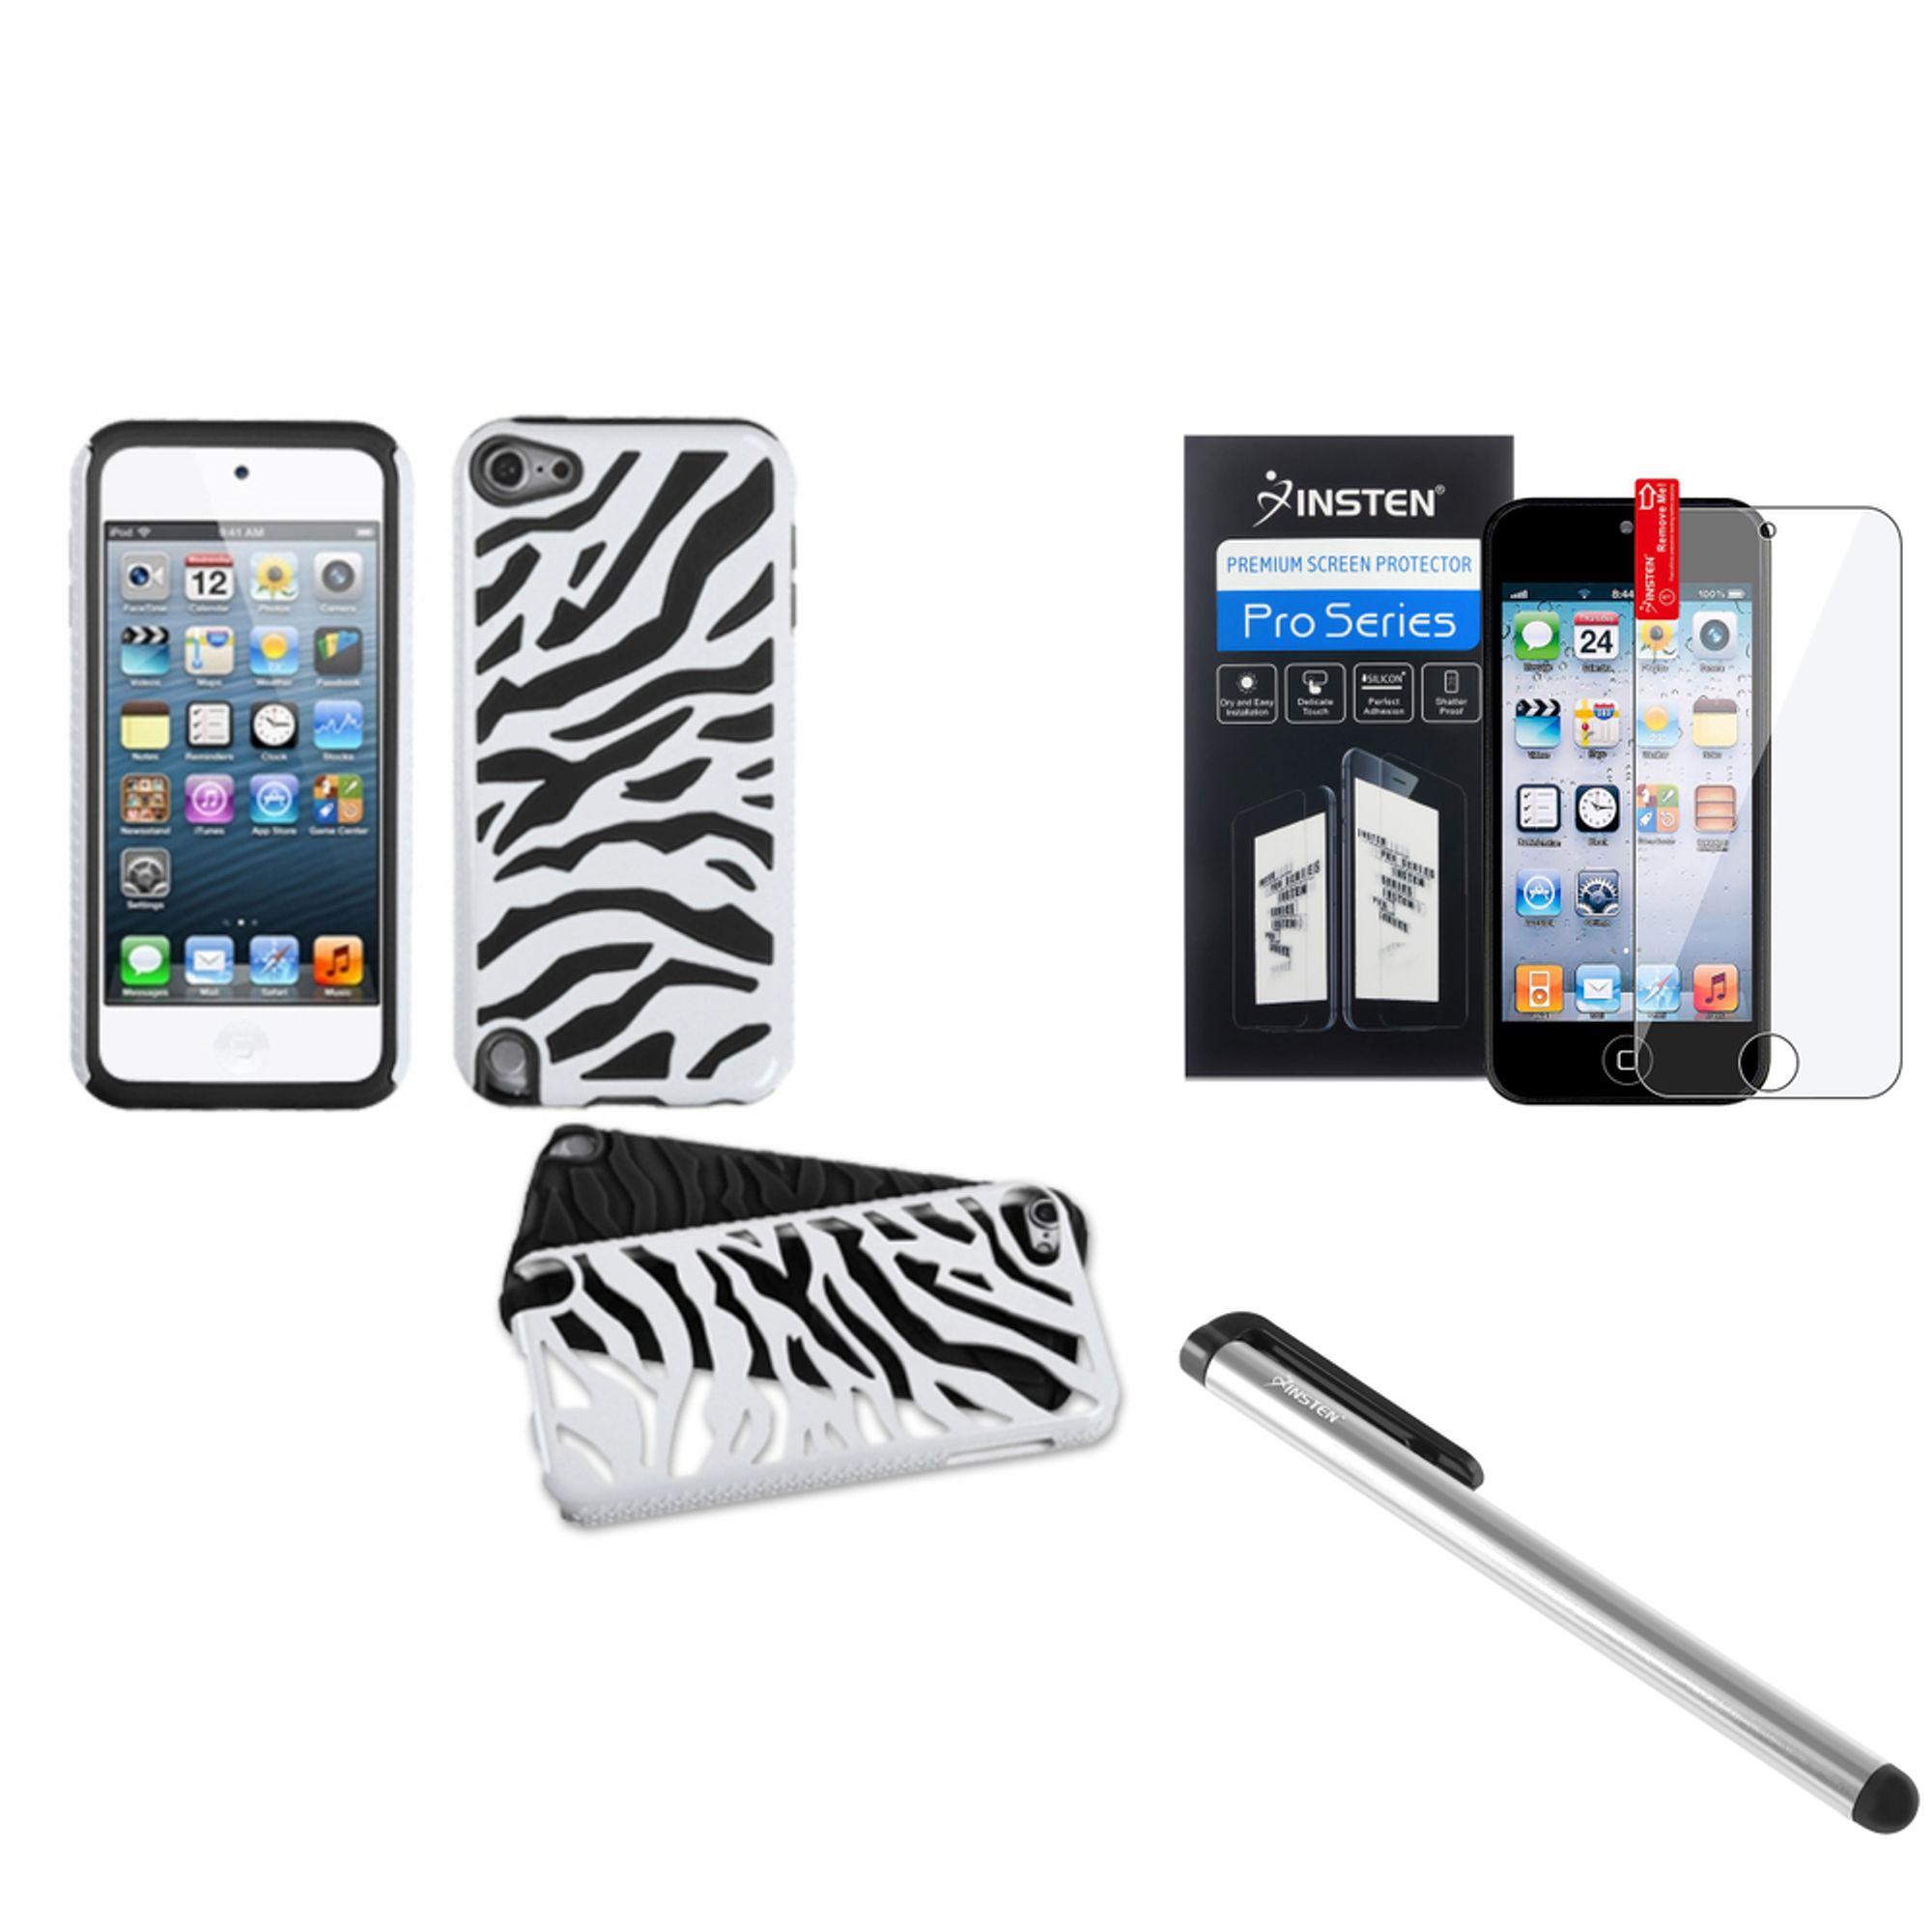 Insten White Black Zebra Hard Soft Silicone Case+LCD Film+Pen For iPod Touch 6G 6 6th 5G 5 5th Gen